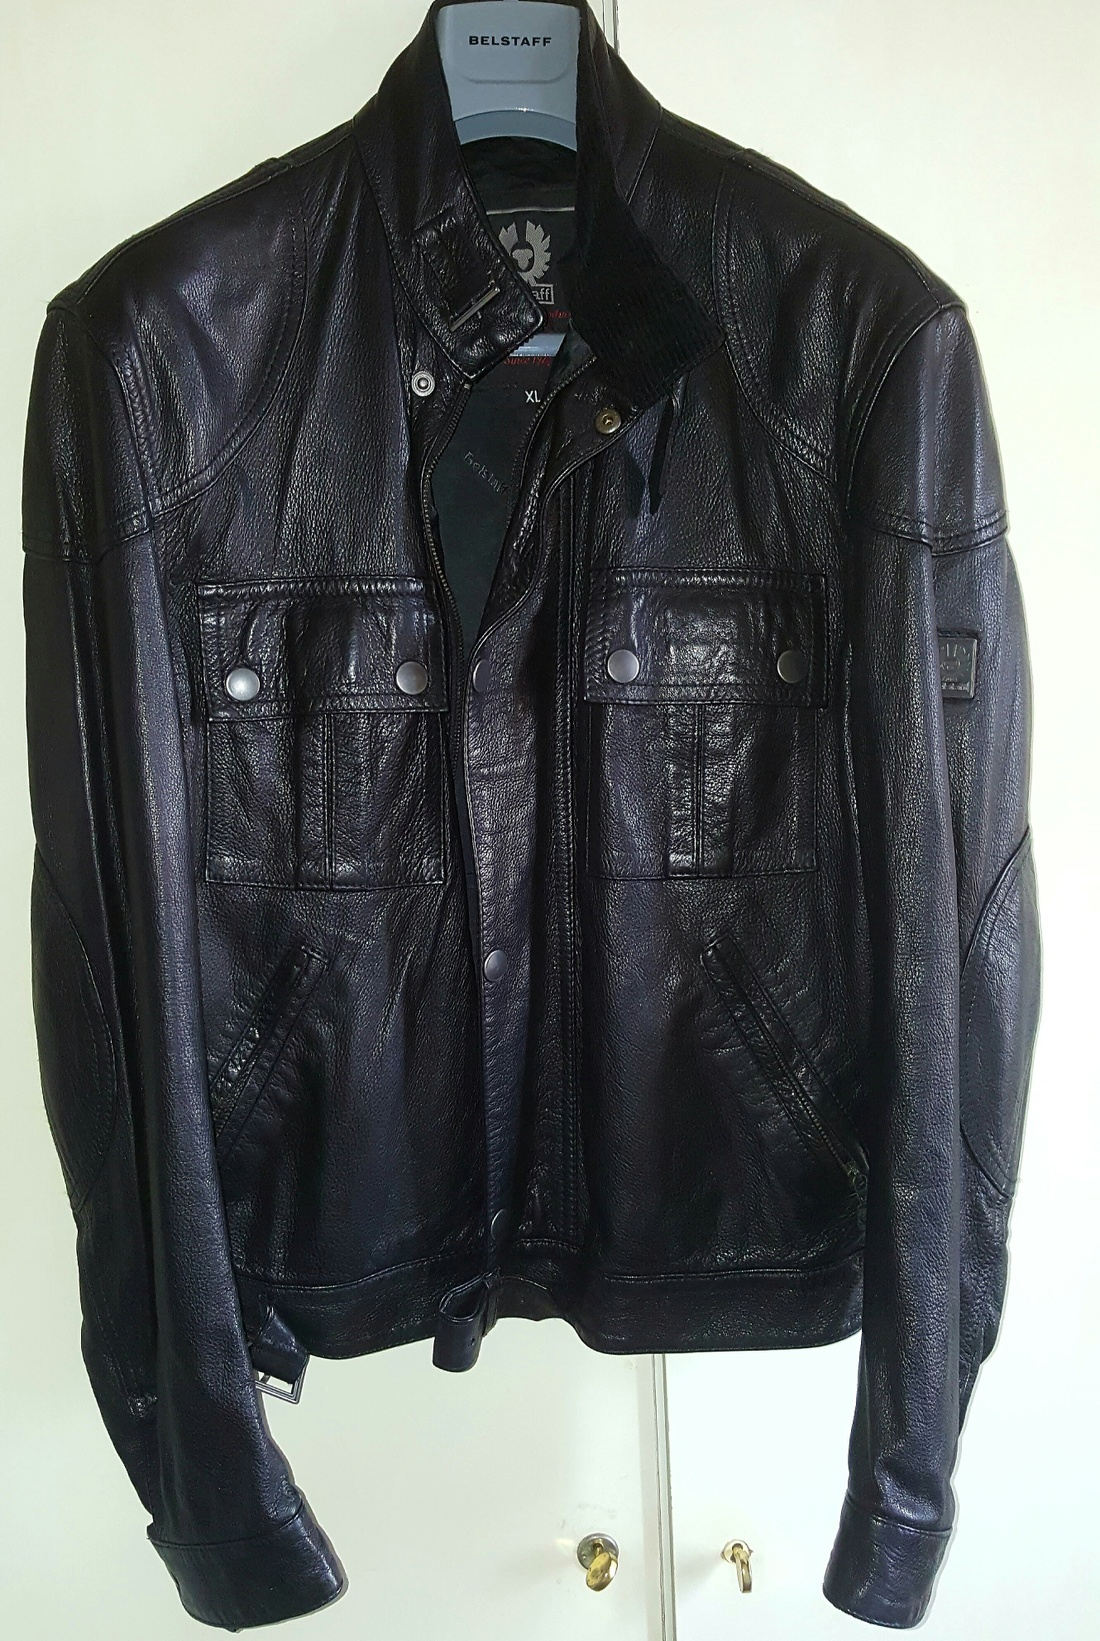 Leather jacket xl size - Belstaff Belstaff Gold Label Cougar Leather Jacket Xl Size Us Xl Eu 56 4